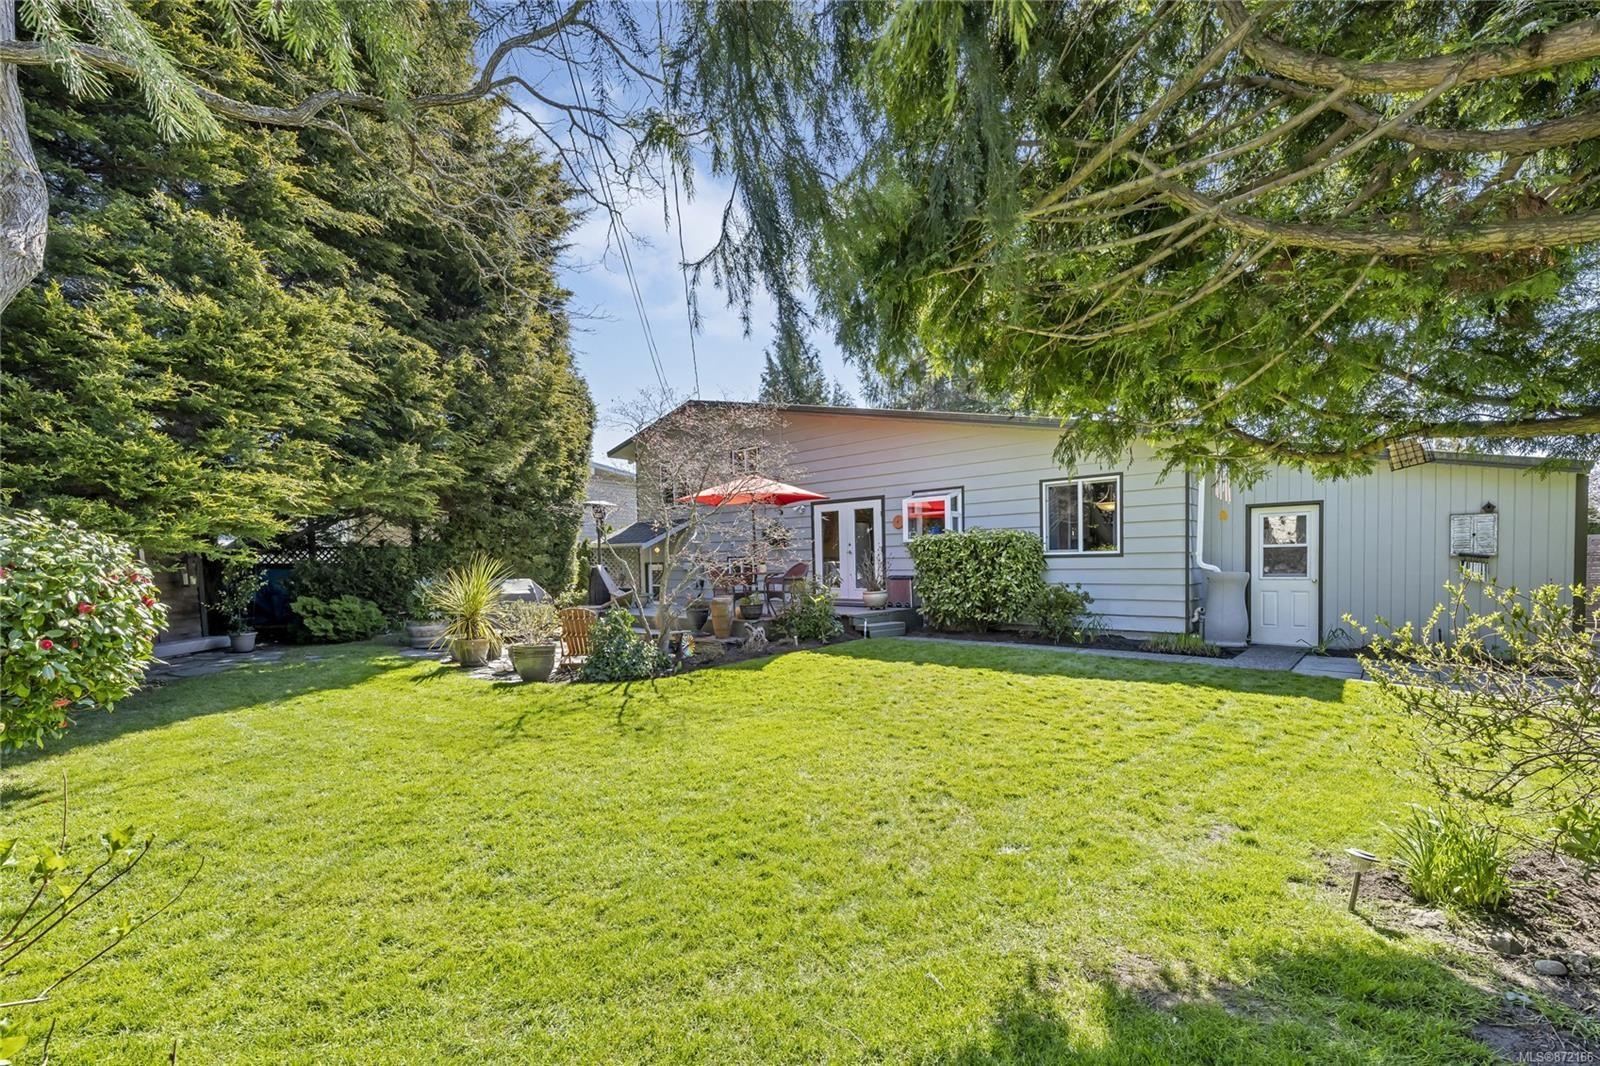 Photo 23: Photos: 1690 Blair Ave in : SE Lambrick Park House for sale (Saanich East)  : MLS®# 872166